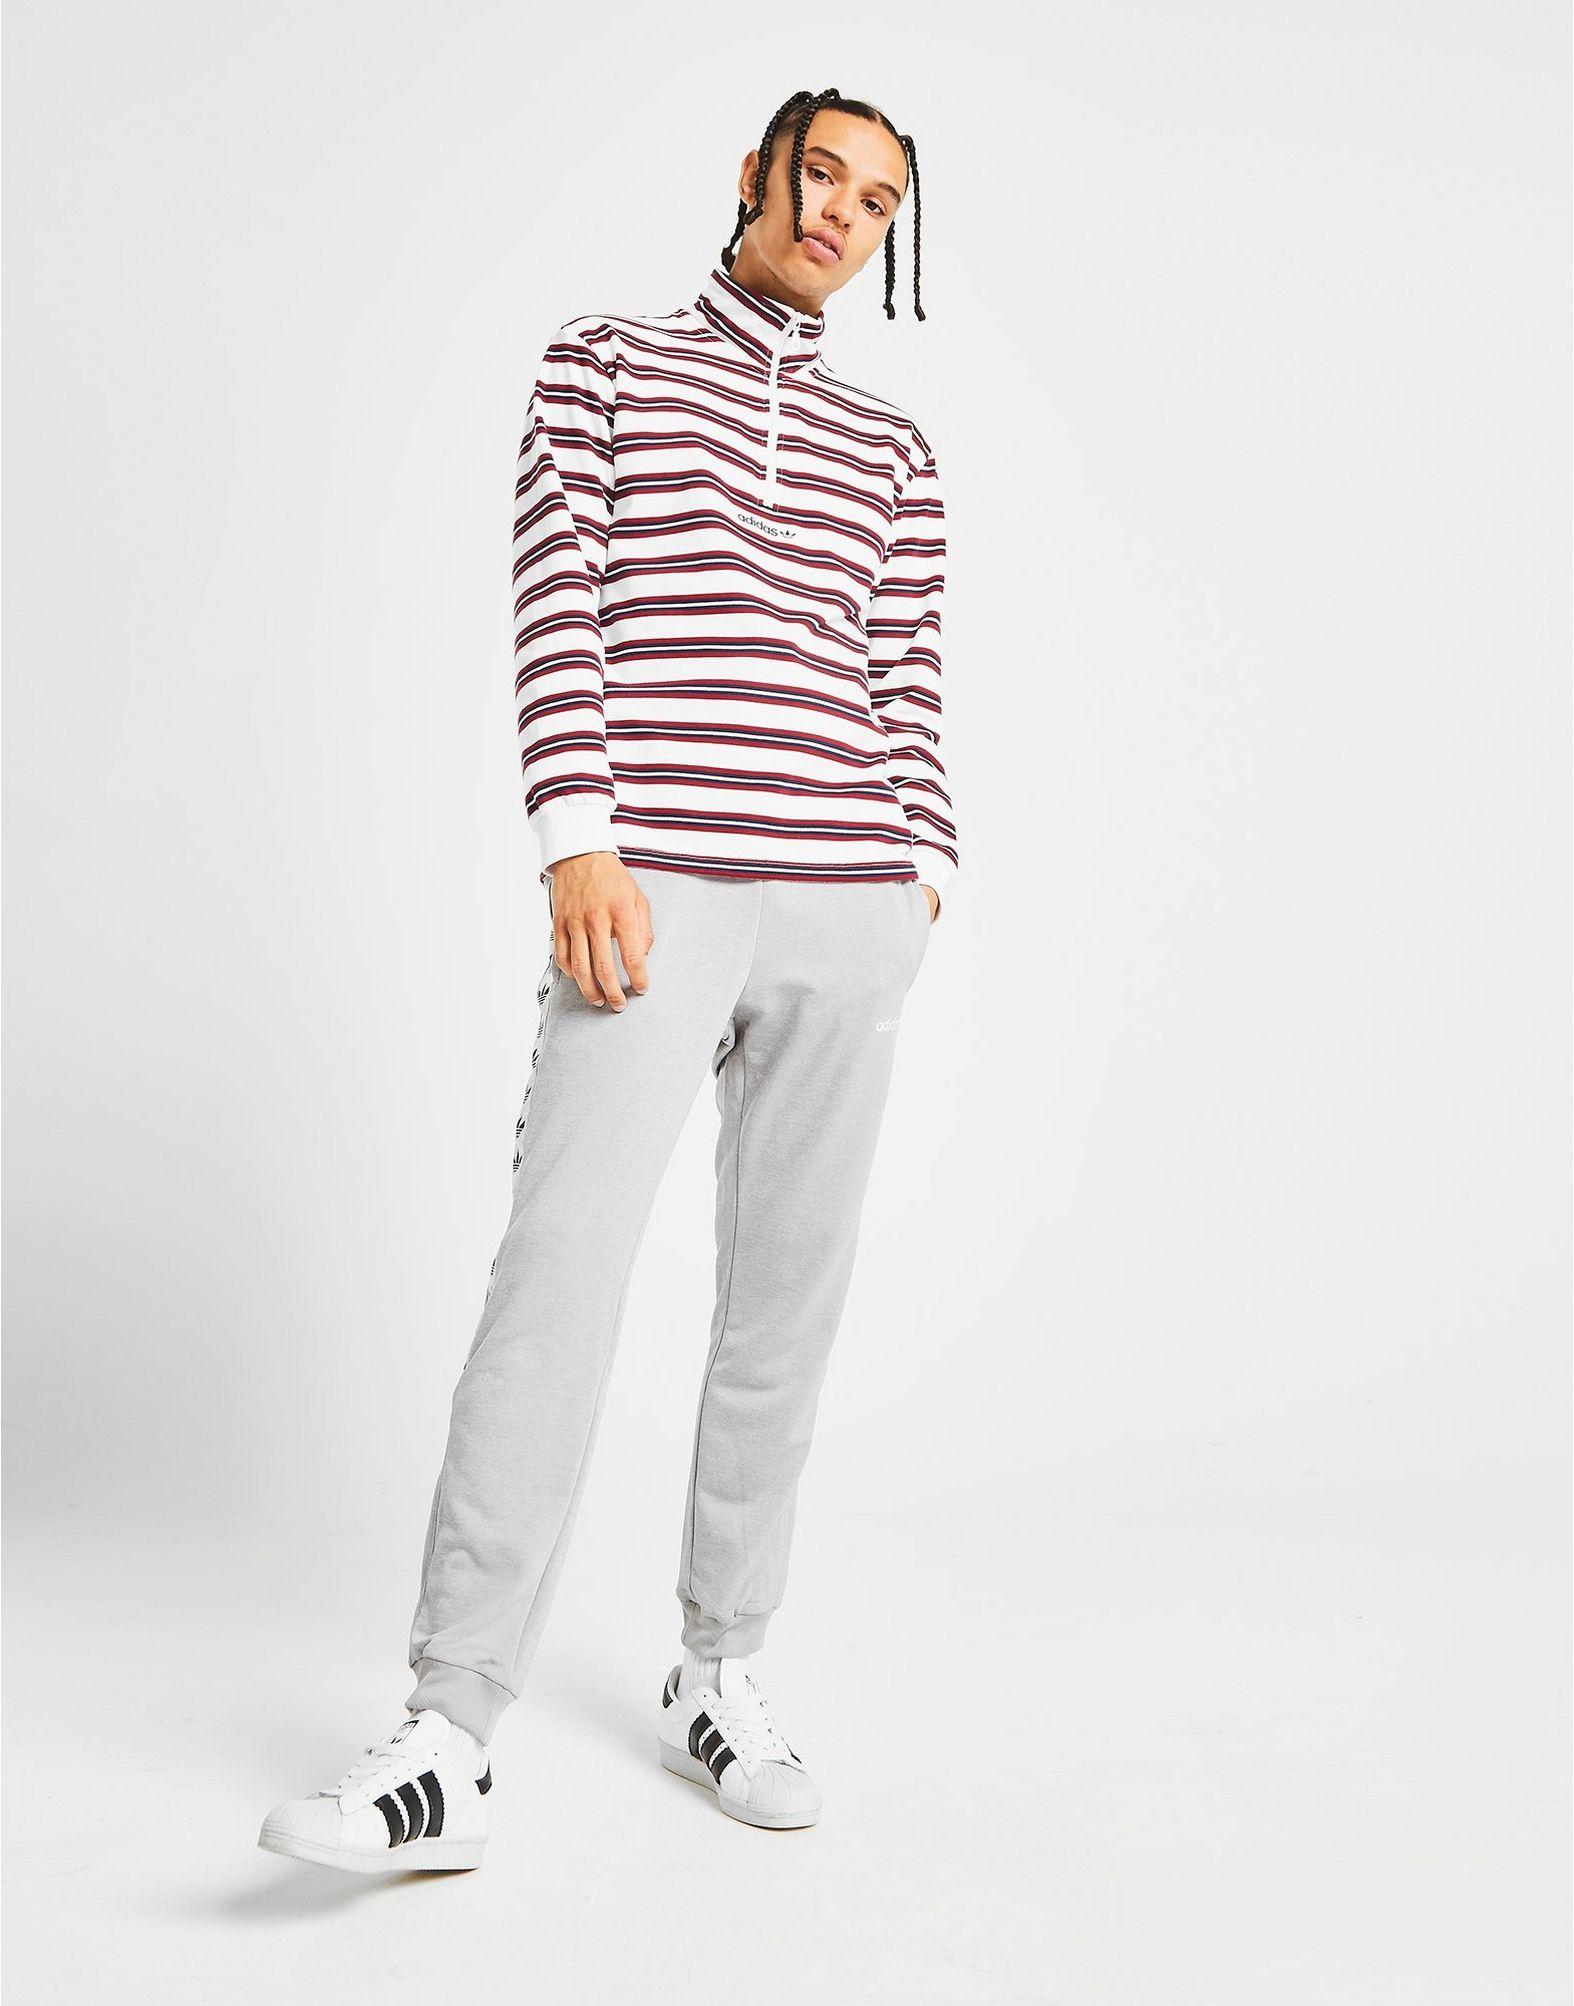 adidas Originals St. Peter 1/2 Zip Sweatshirt White